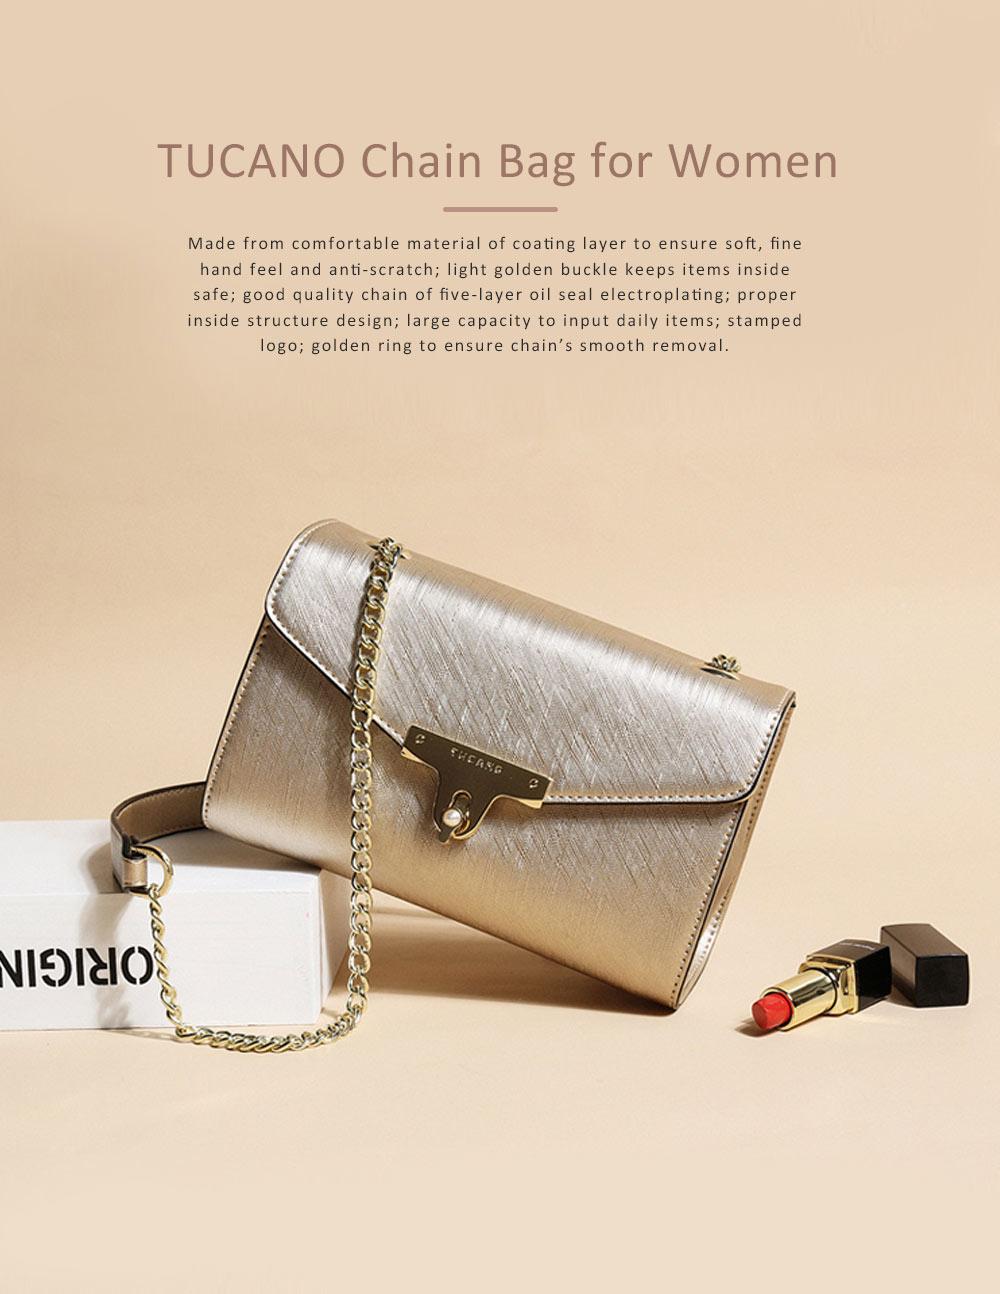 TUCANO Chain Bag for Women, Fashionable Square Messenger Bag for Women Spring Summer, Single-shoulder Bag 0